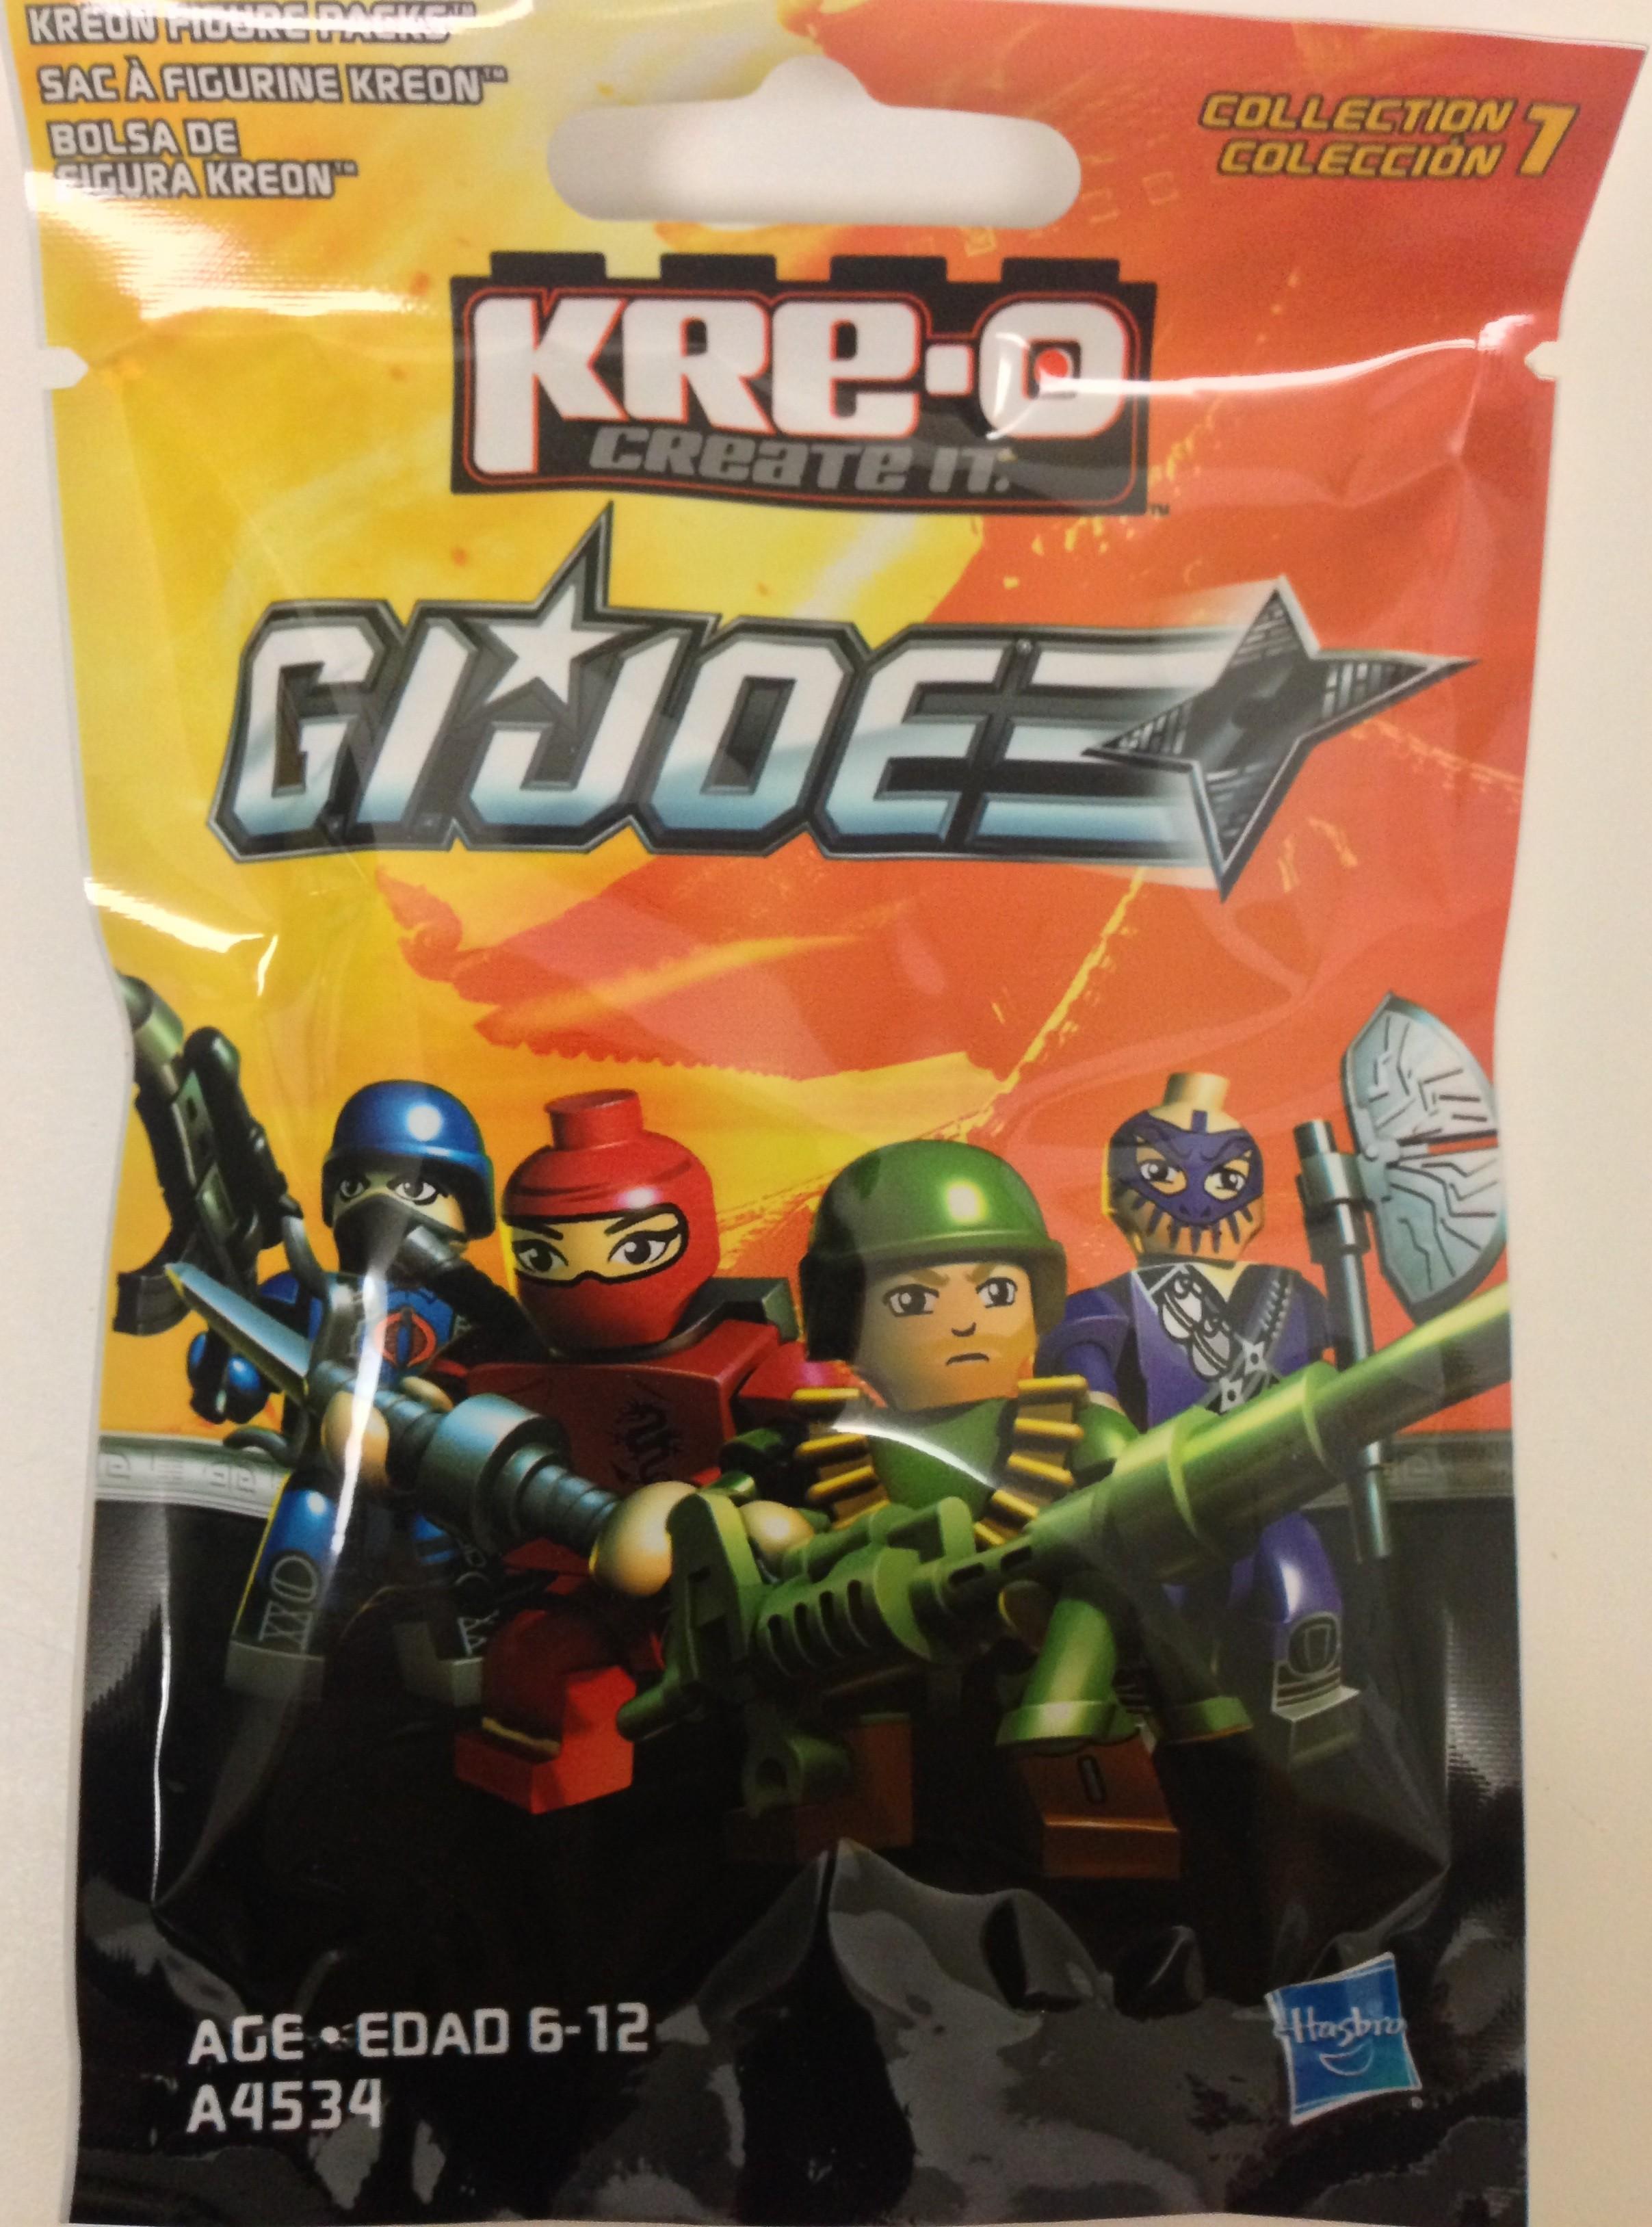 Joe Cobra Slice Action Figure Kreo GI Joe Complete A4534 KRE-O G.I